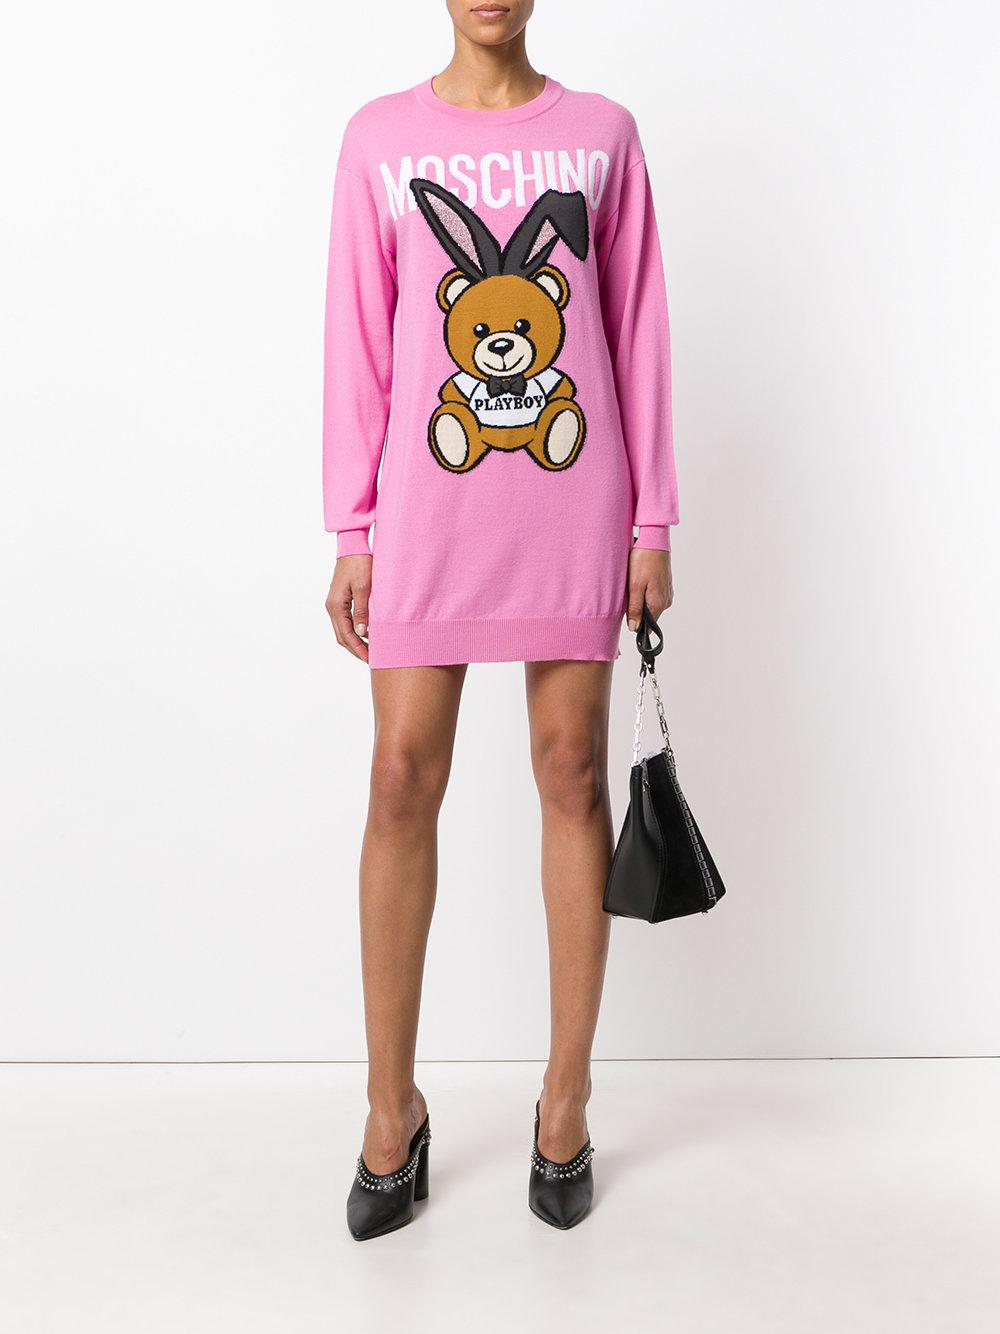 b58599bd2b4 Moschino Playboy Toy Bear Sweater Dress - Lyst